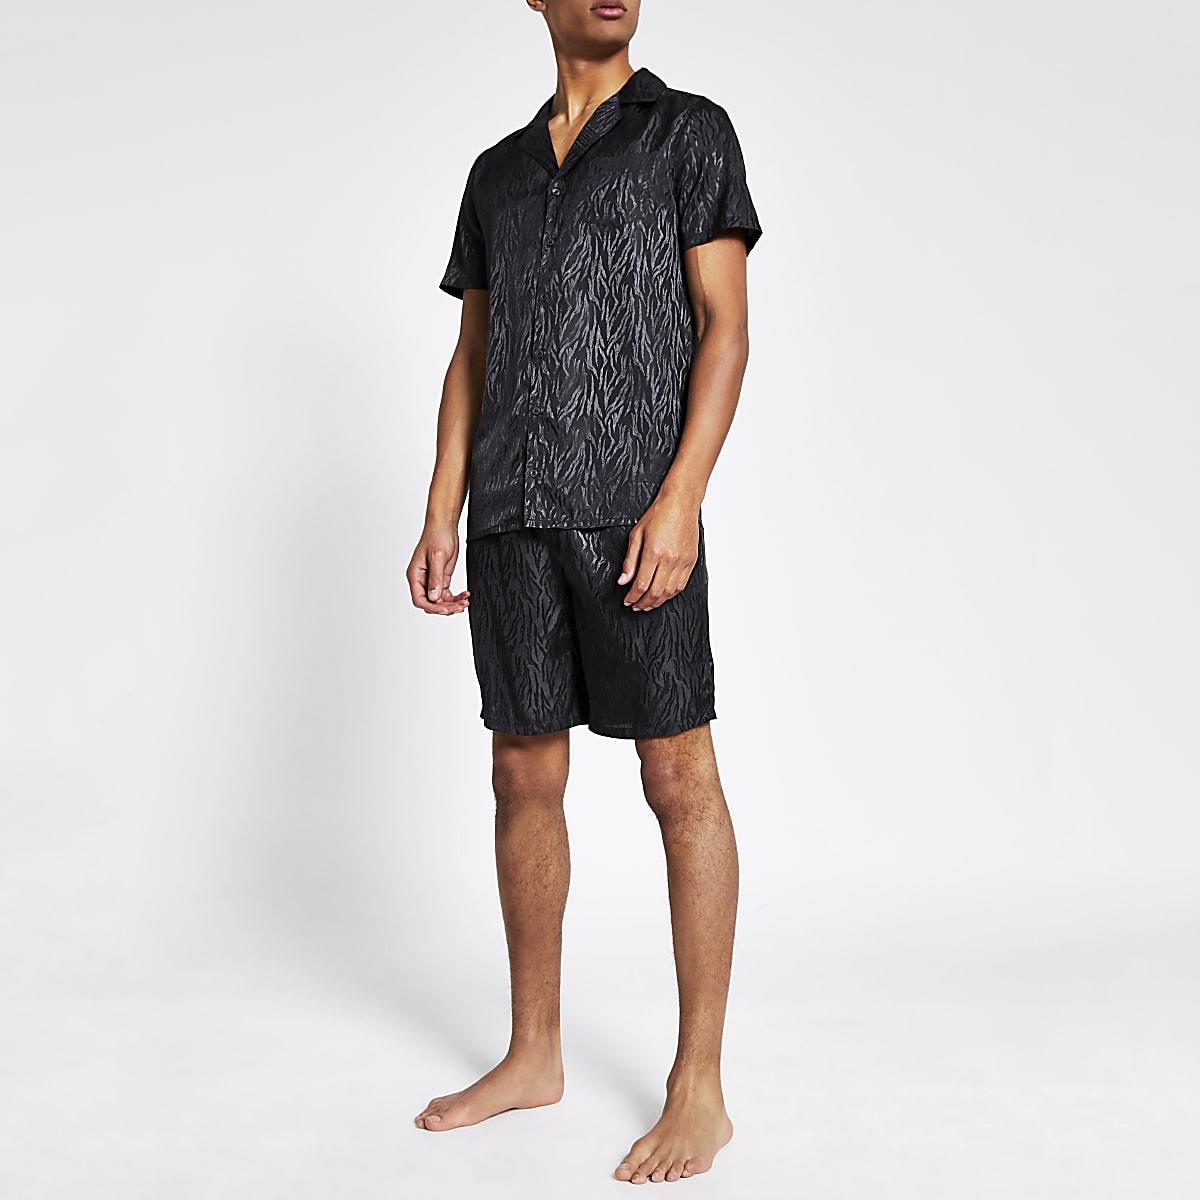 Black zebra print short pyjama set